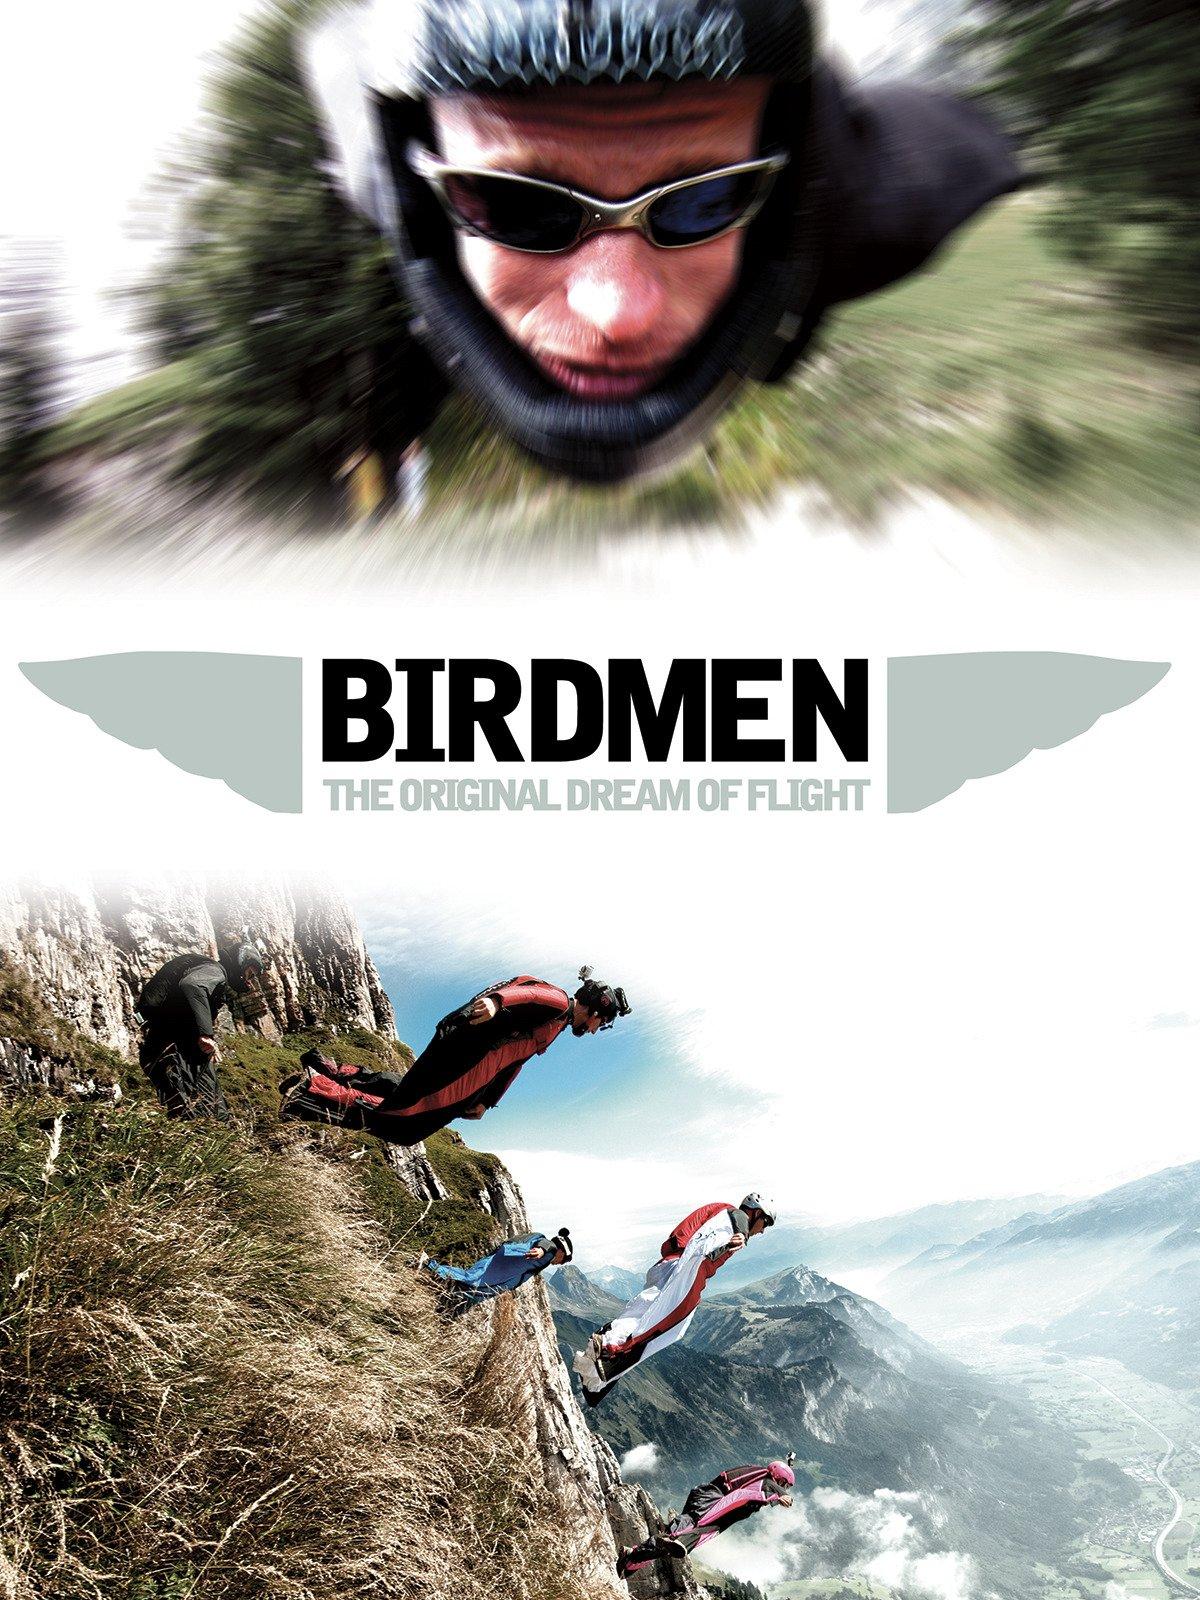 Birdmen: The Original Dream of Human Flight